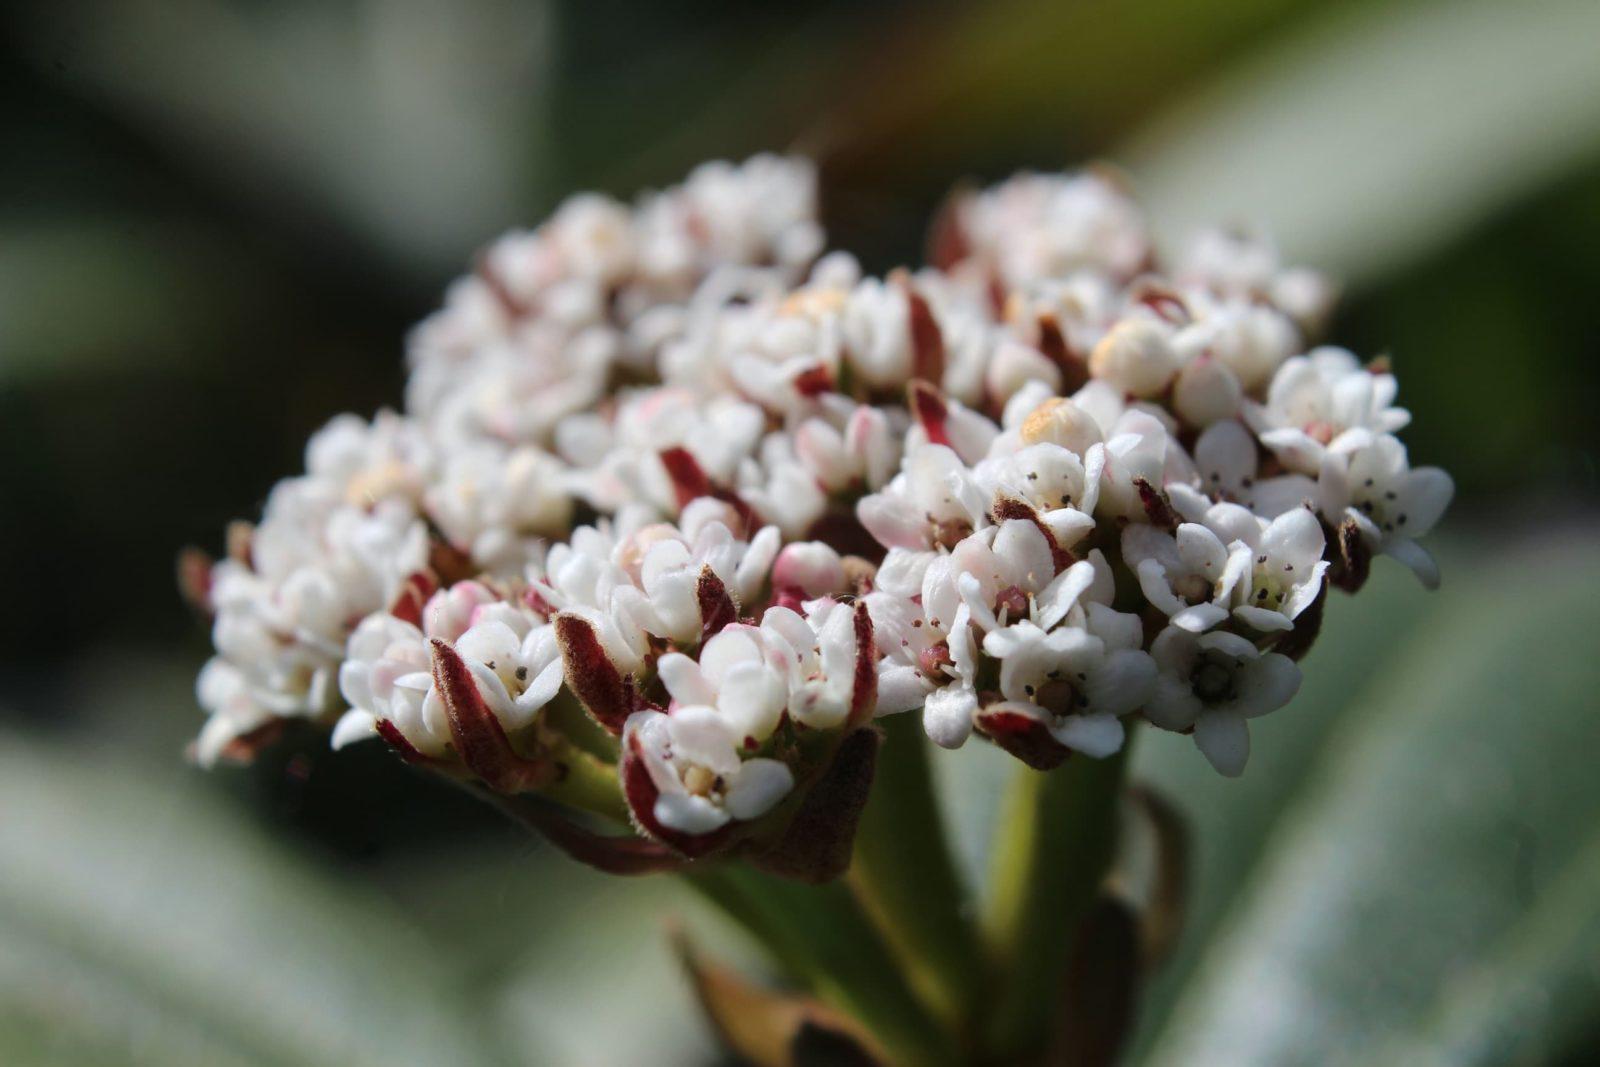 close up of the white leaves of vibernum davidii